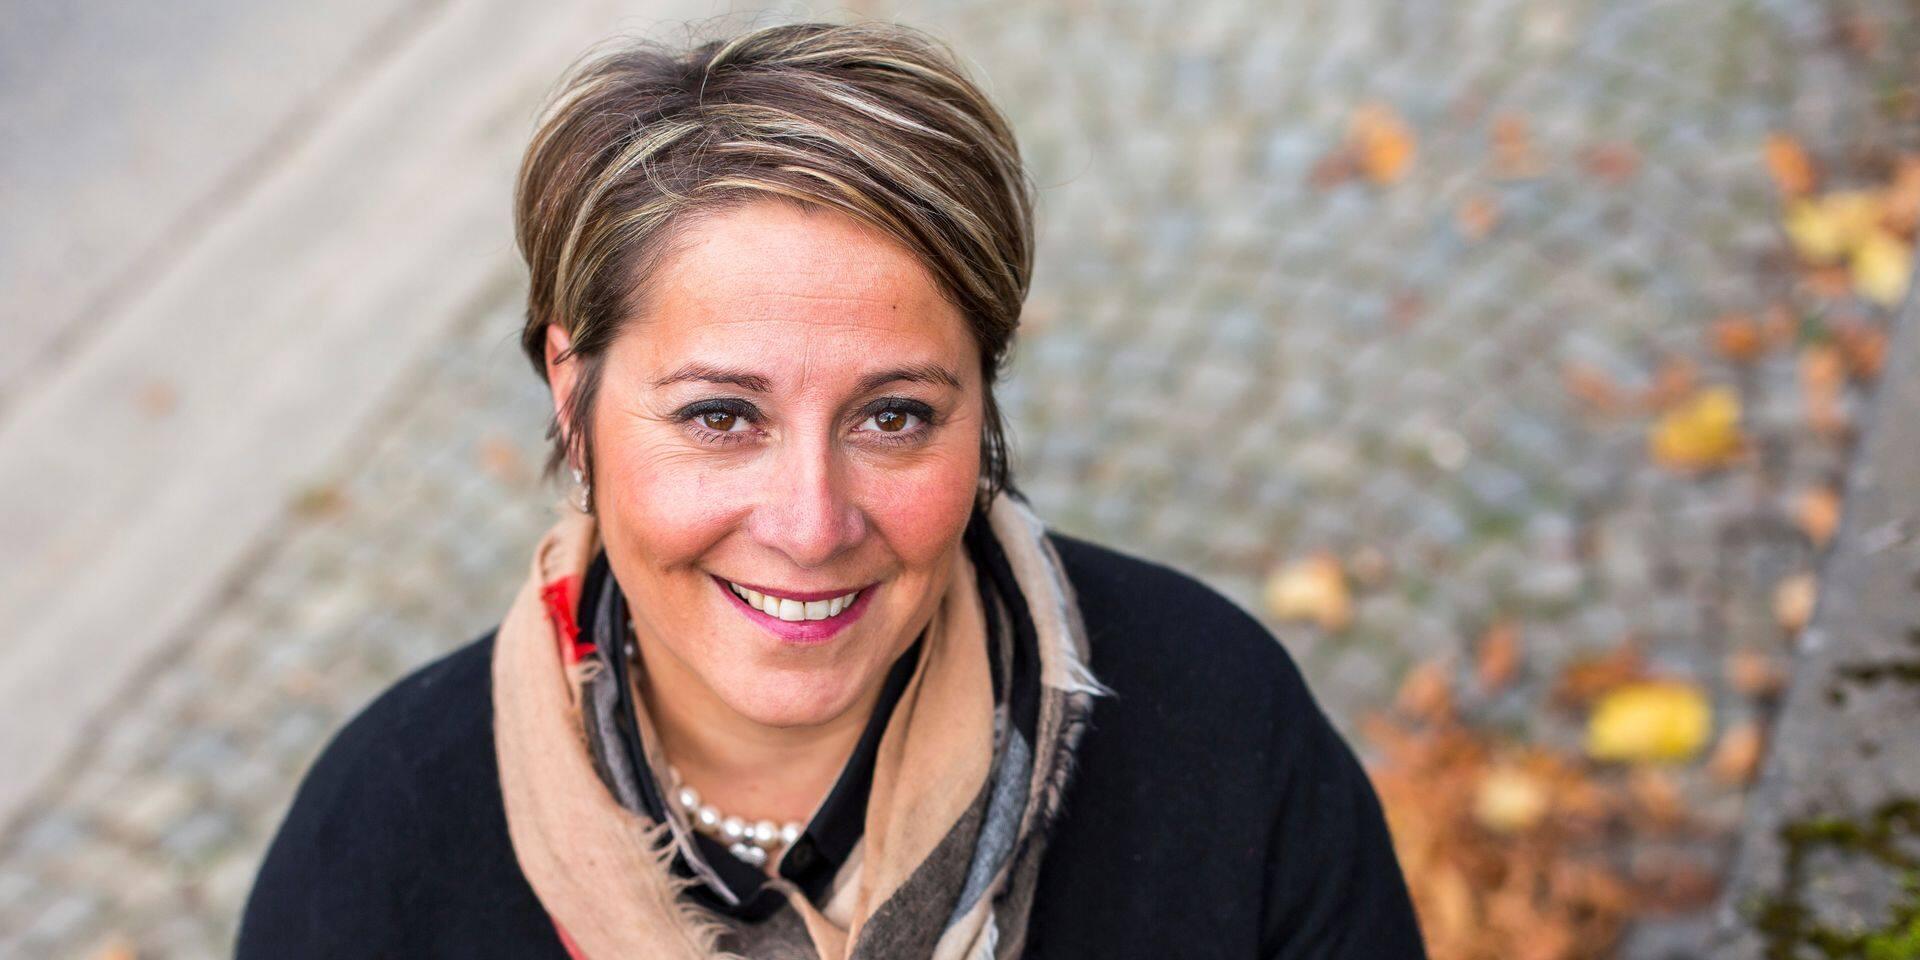 Communales à Ouffet : Caroline Cassart conserve son mayorat